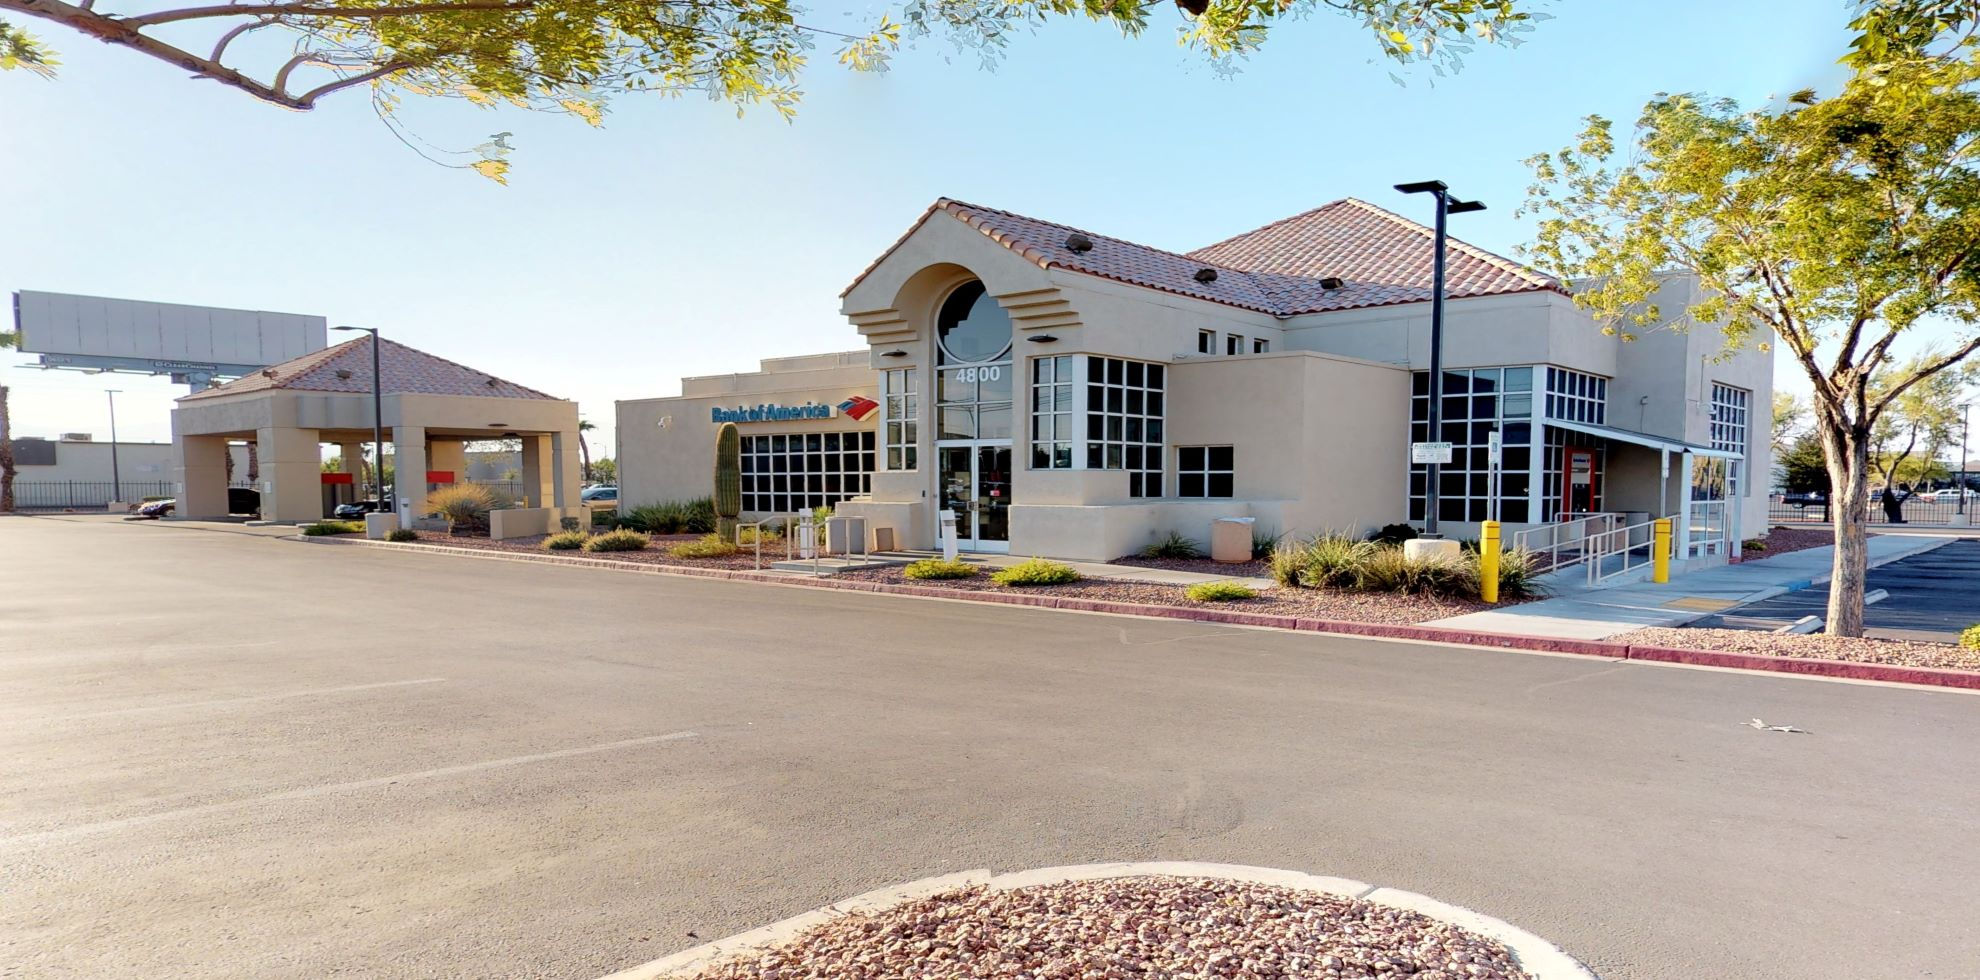 Bank of America financial center with drive-thru ATM   4800 W Tropicana Ave, Las Vegas, NV 89103